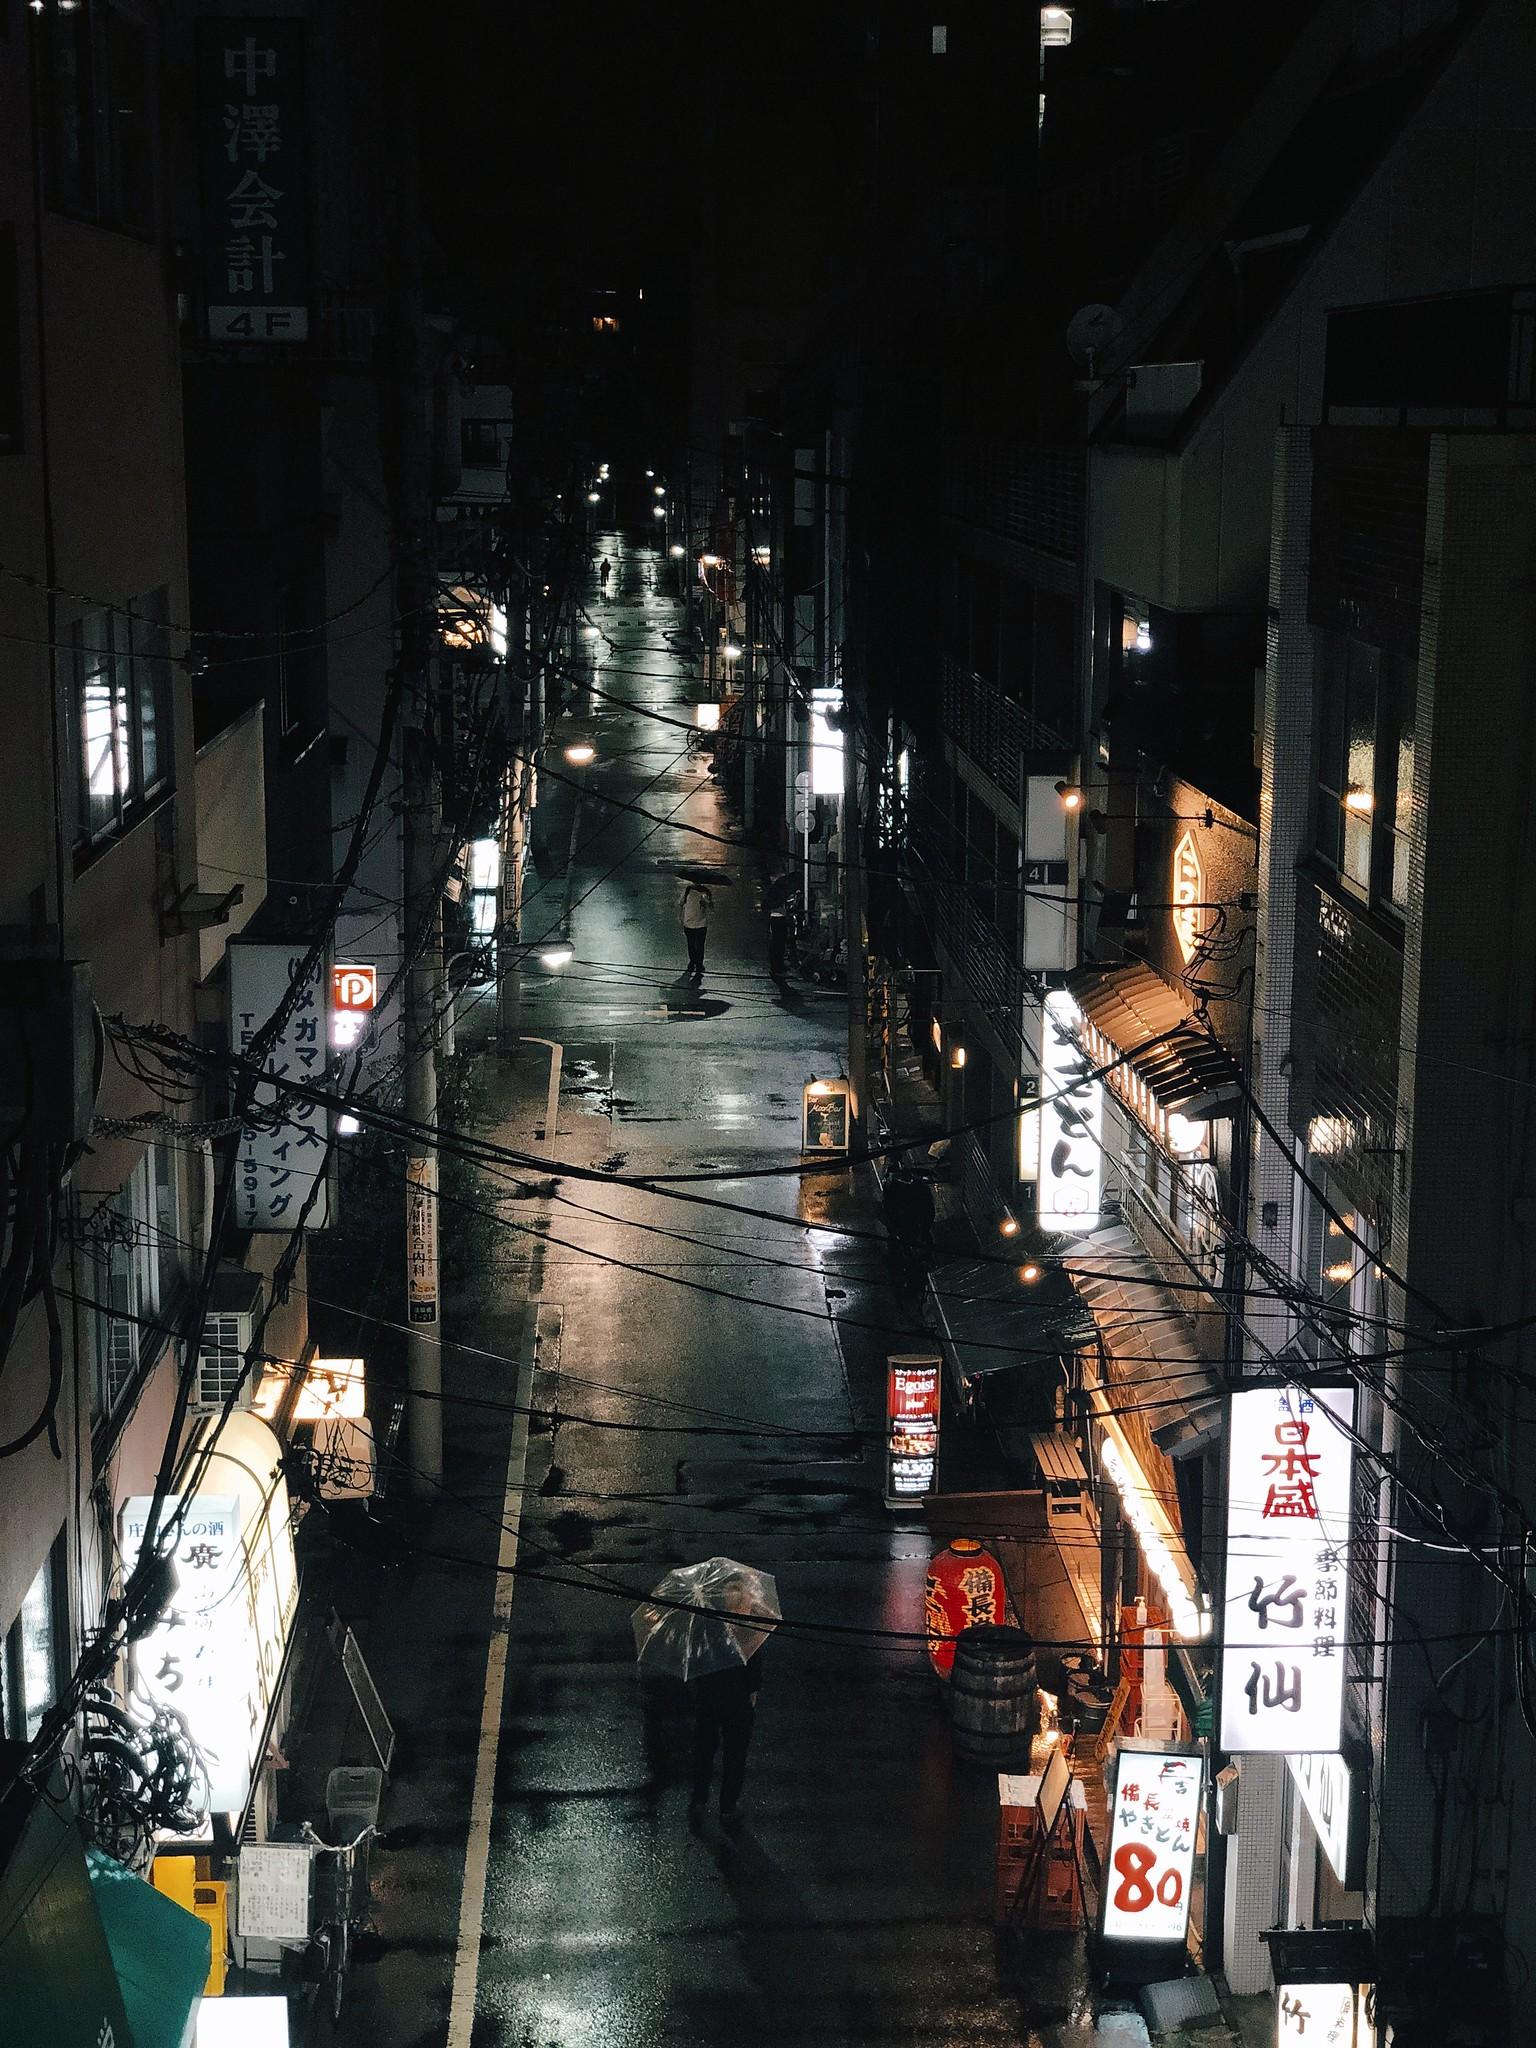 Asakusabashi in Tokyo, Japan. #iPhone #ShotoniPhone #RNIFilms #Apple #iPhoneX #Tokyo